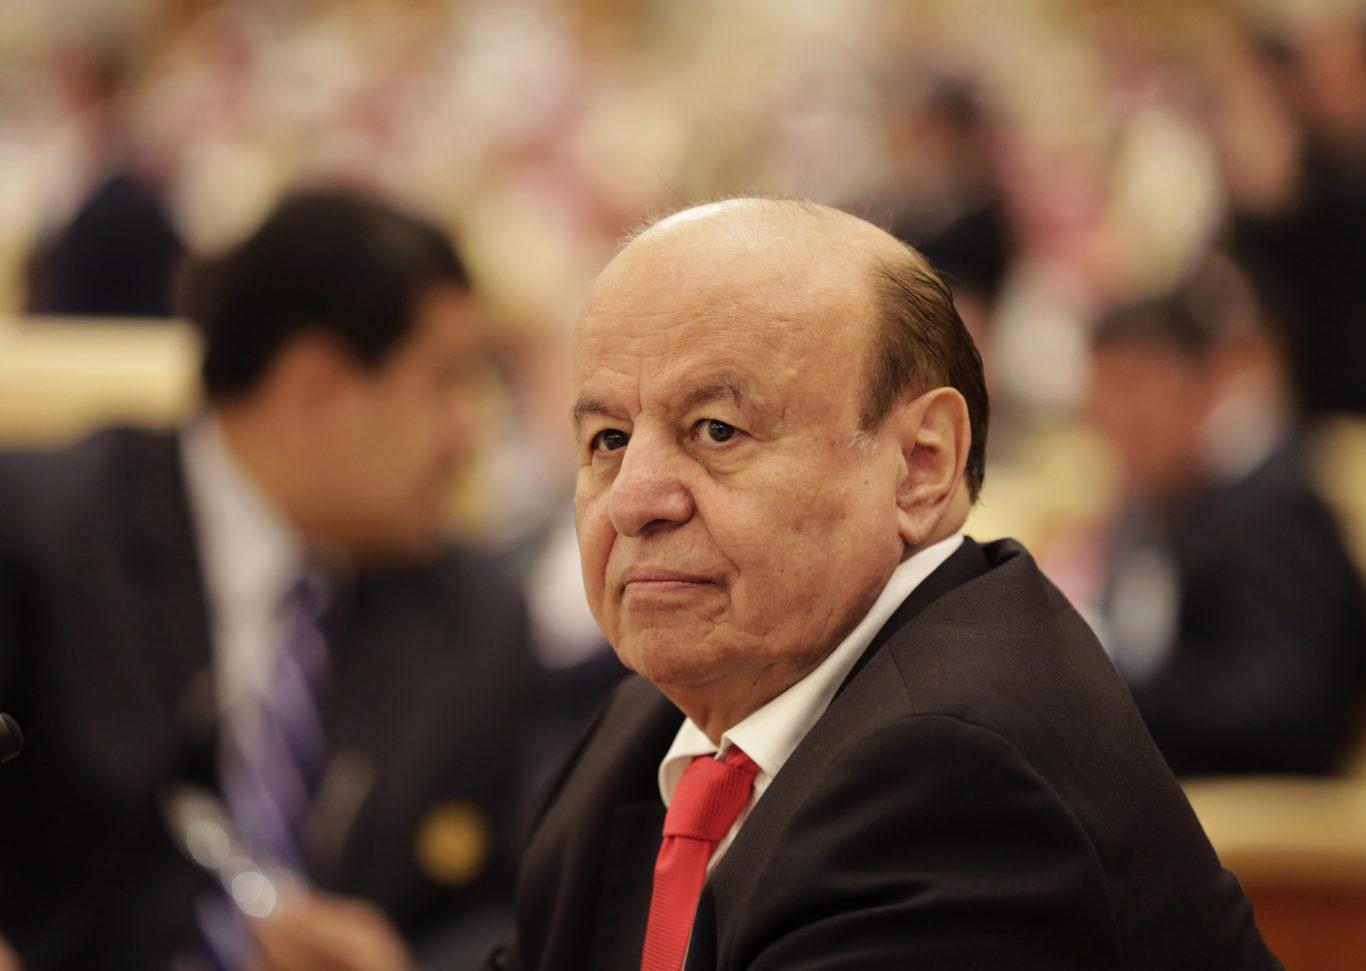 The president of Yemen Abed Rabbo Mansour Hadi